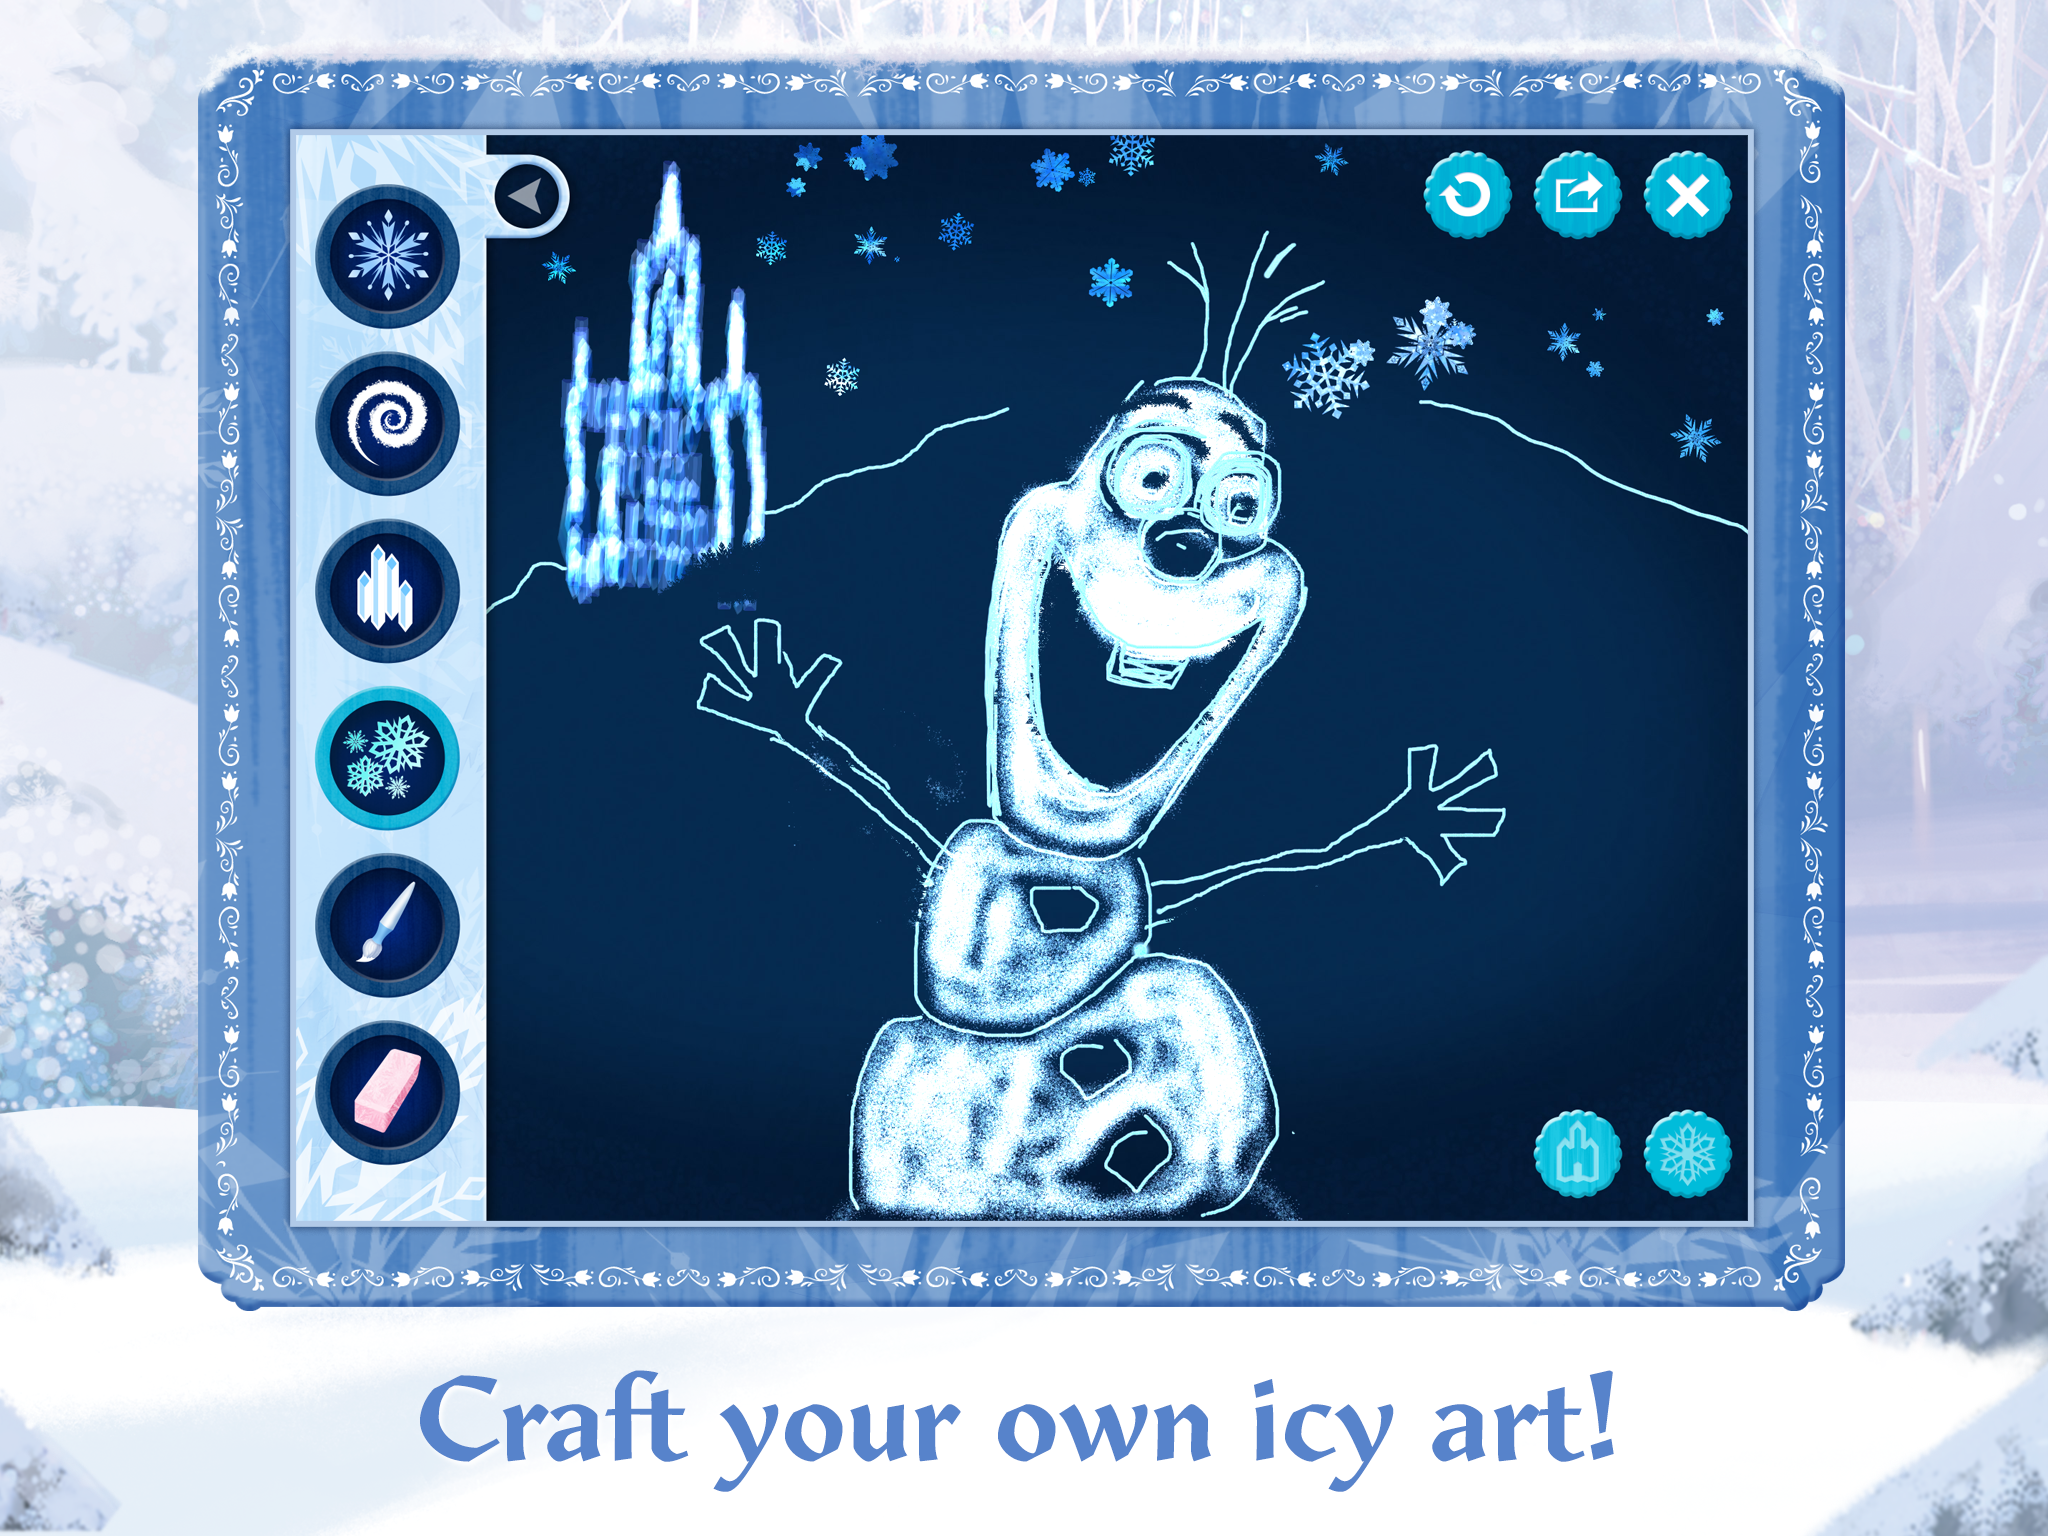 how to fix ipad when it is frozen